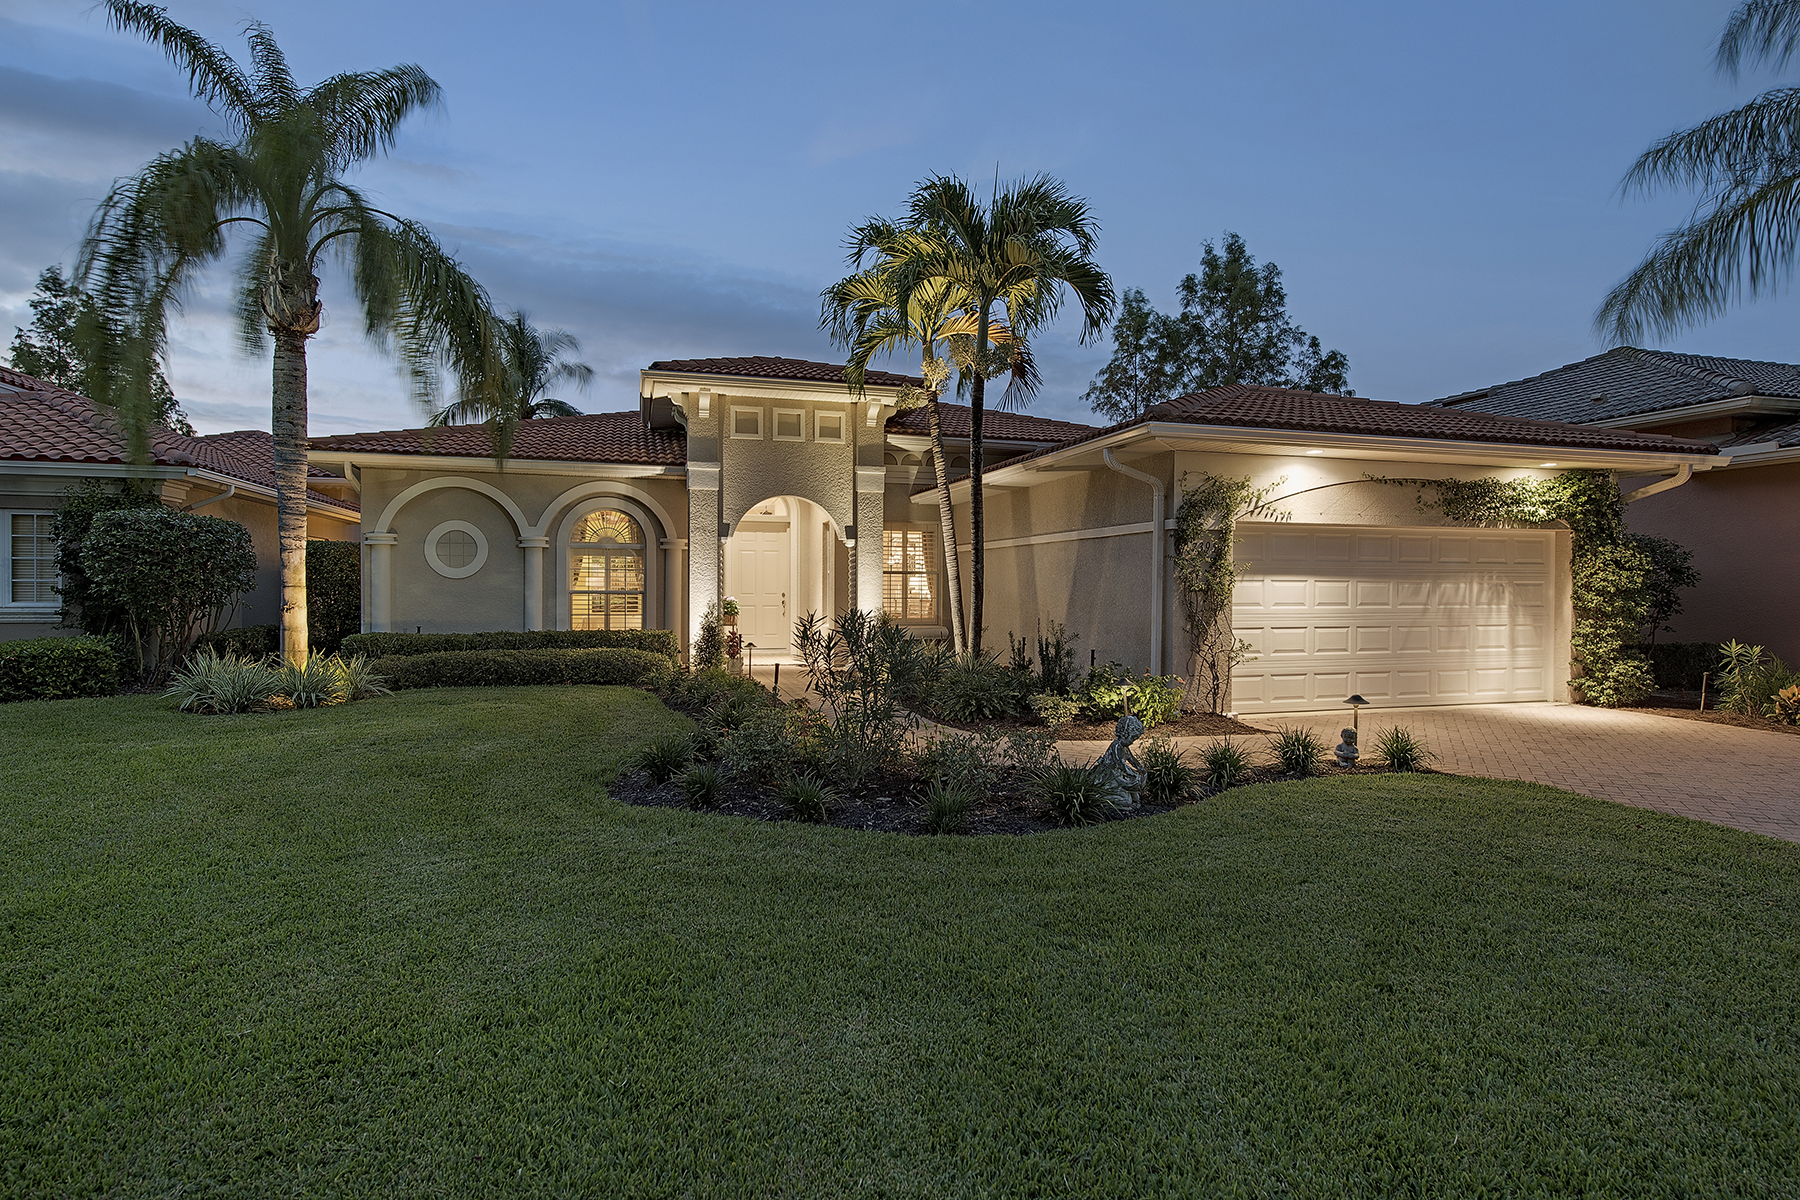 Single Family Home for Sale at OLDE CYPRESS - SANTA ROSA 7395 Monteverde Way Naples, Florida 34119 United States